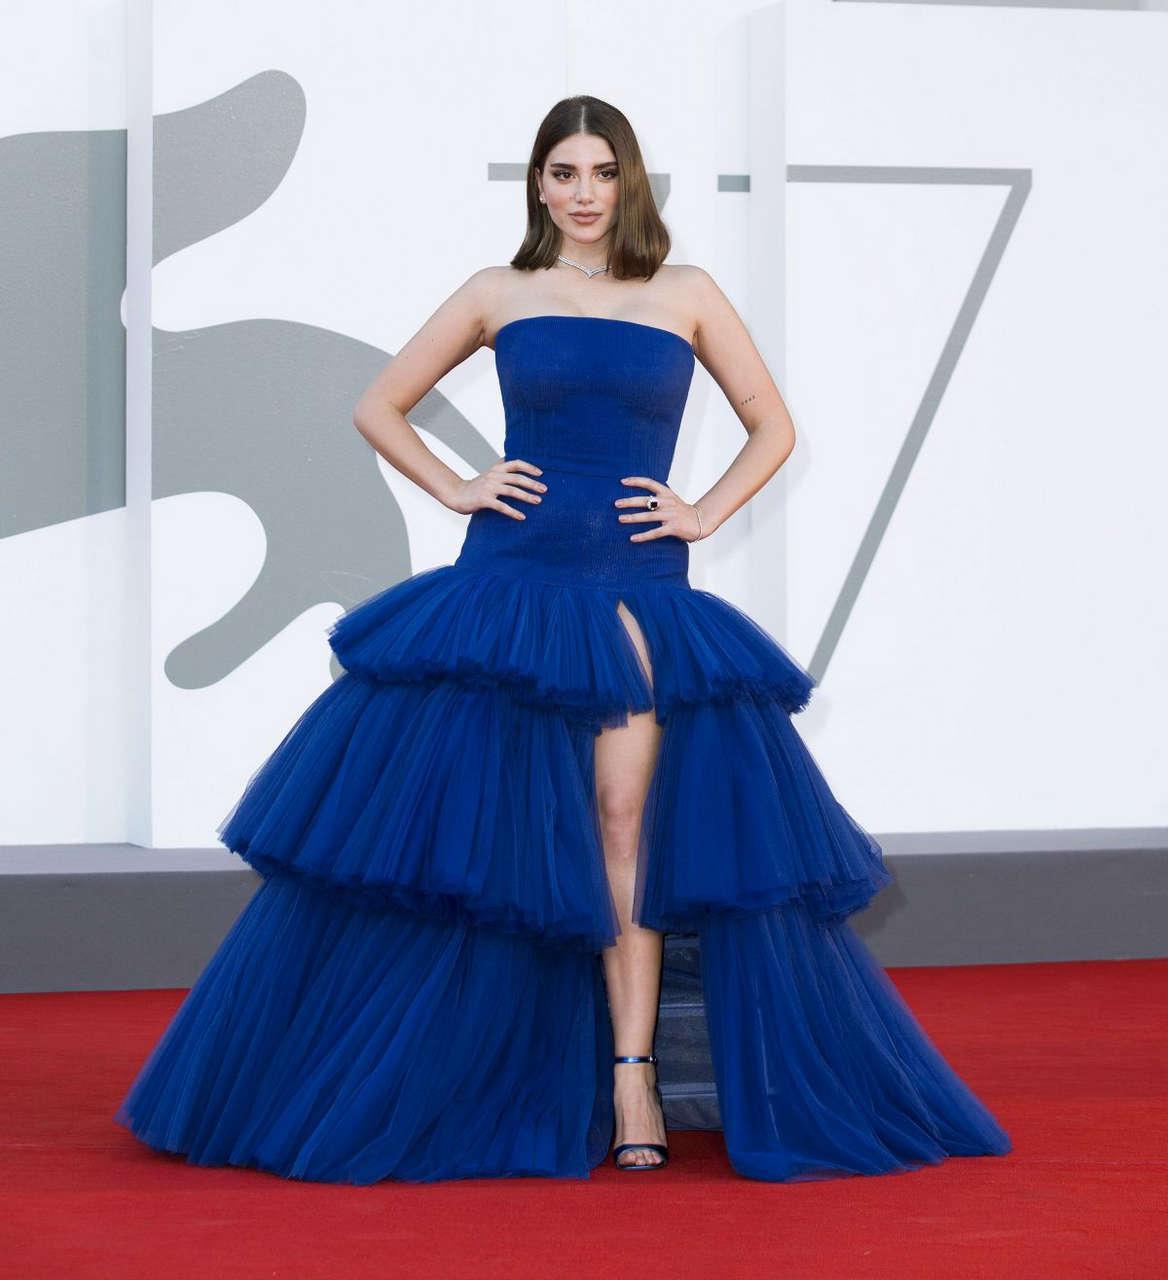 Cynthia Samuel Nomadland Premiere 77th Venice Film Festival